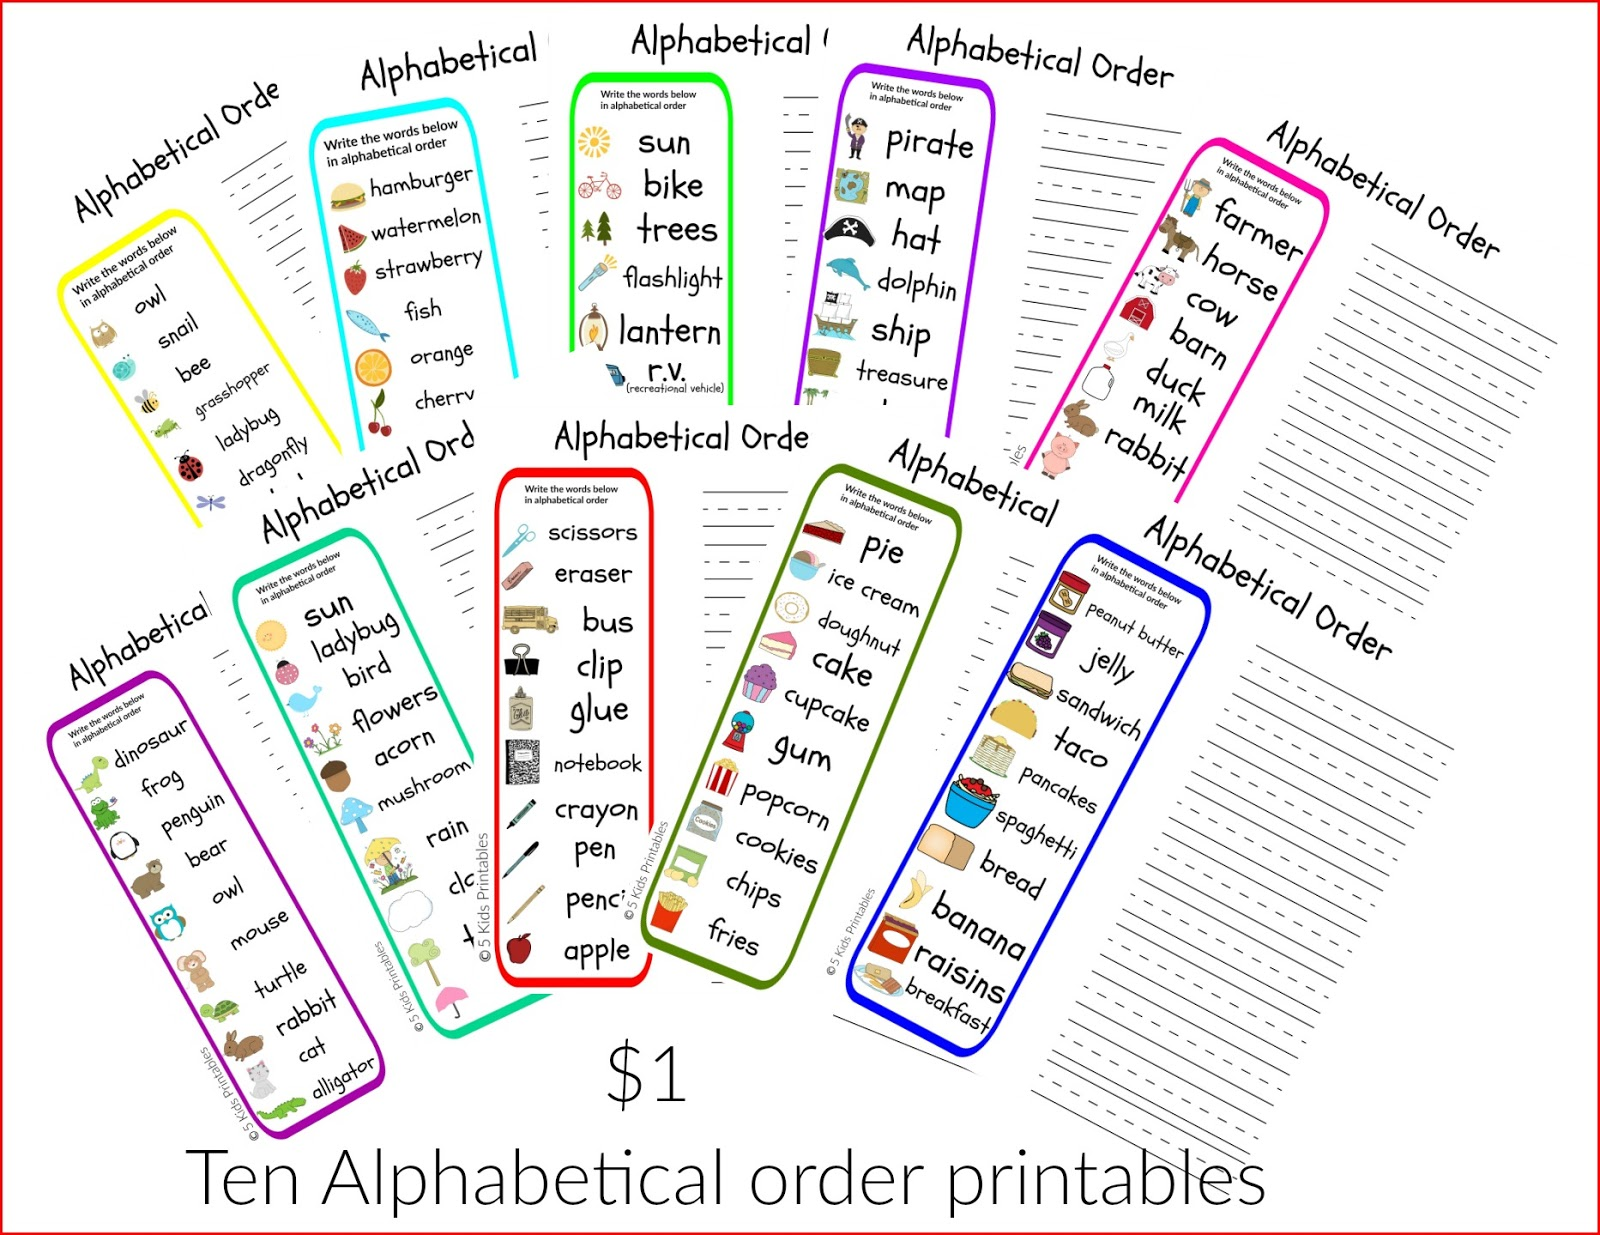 Alphabetical Order Printables